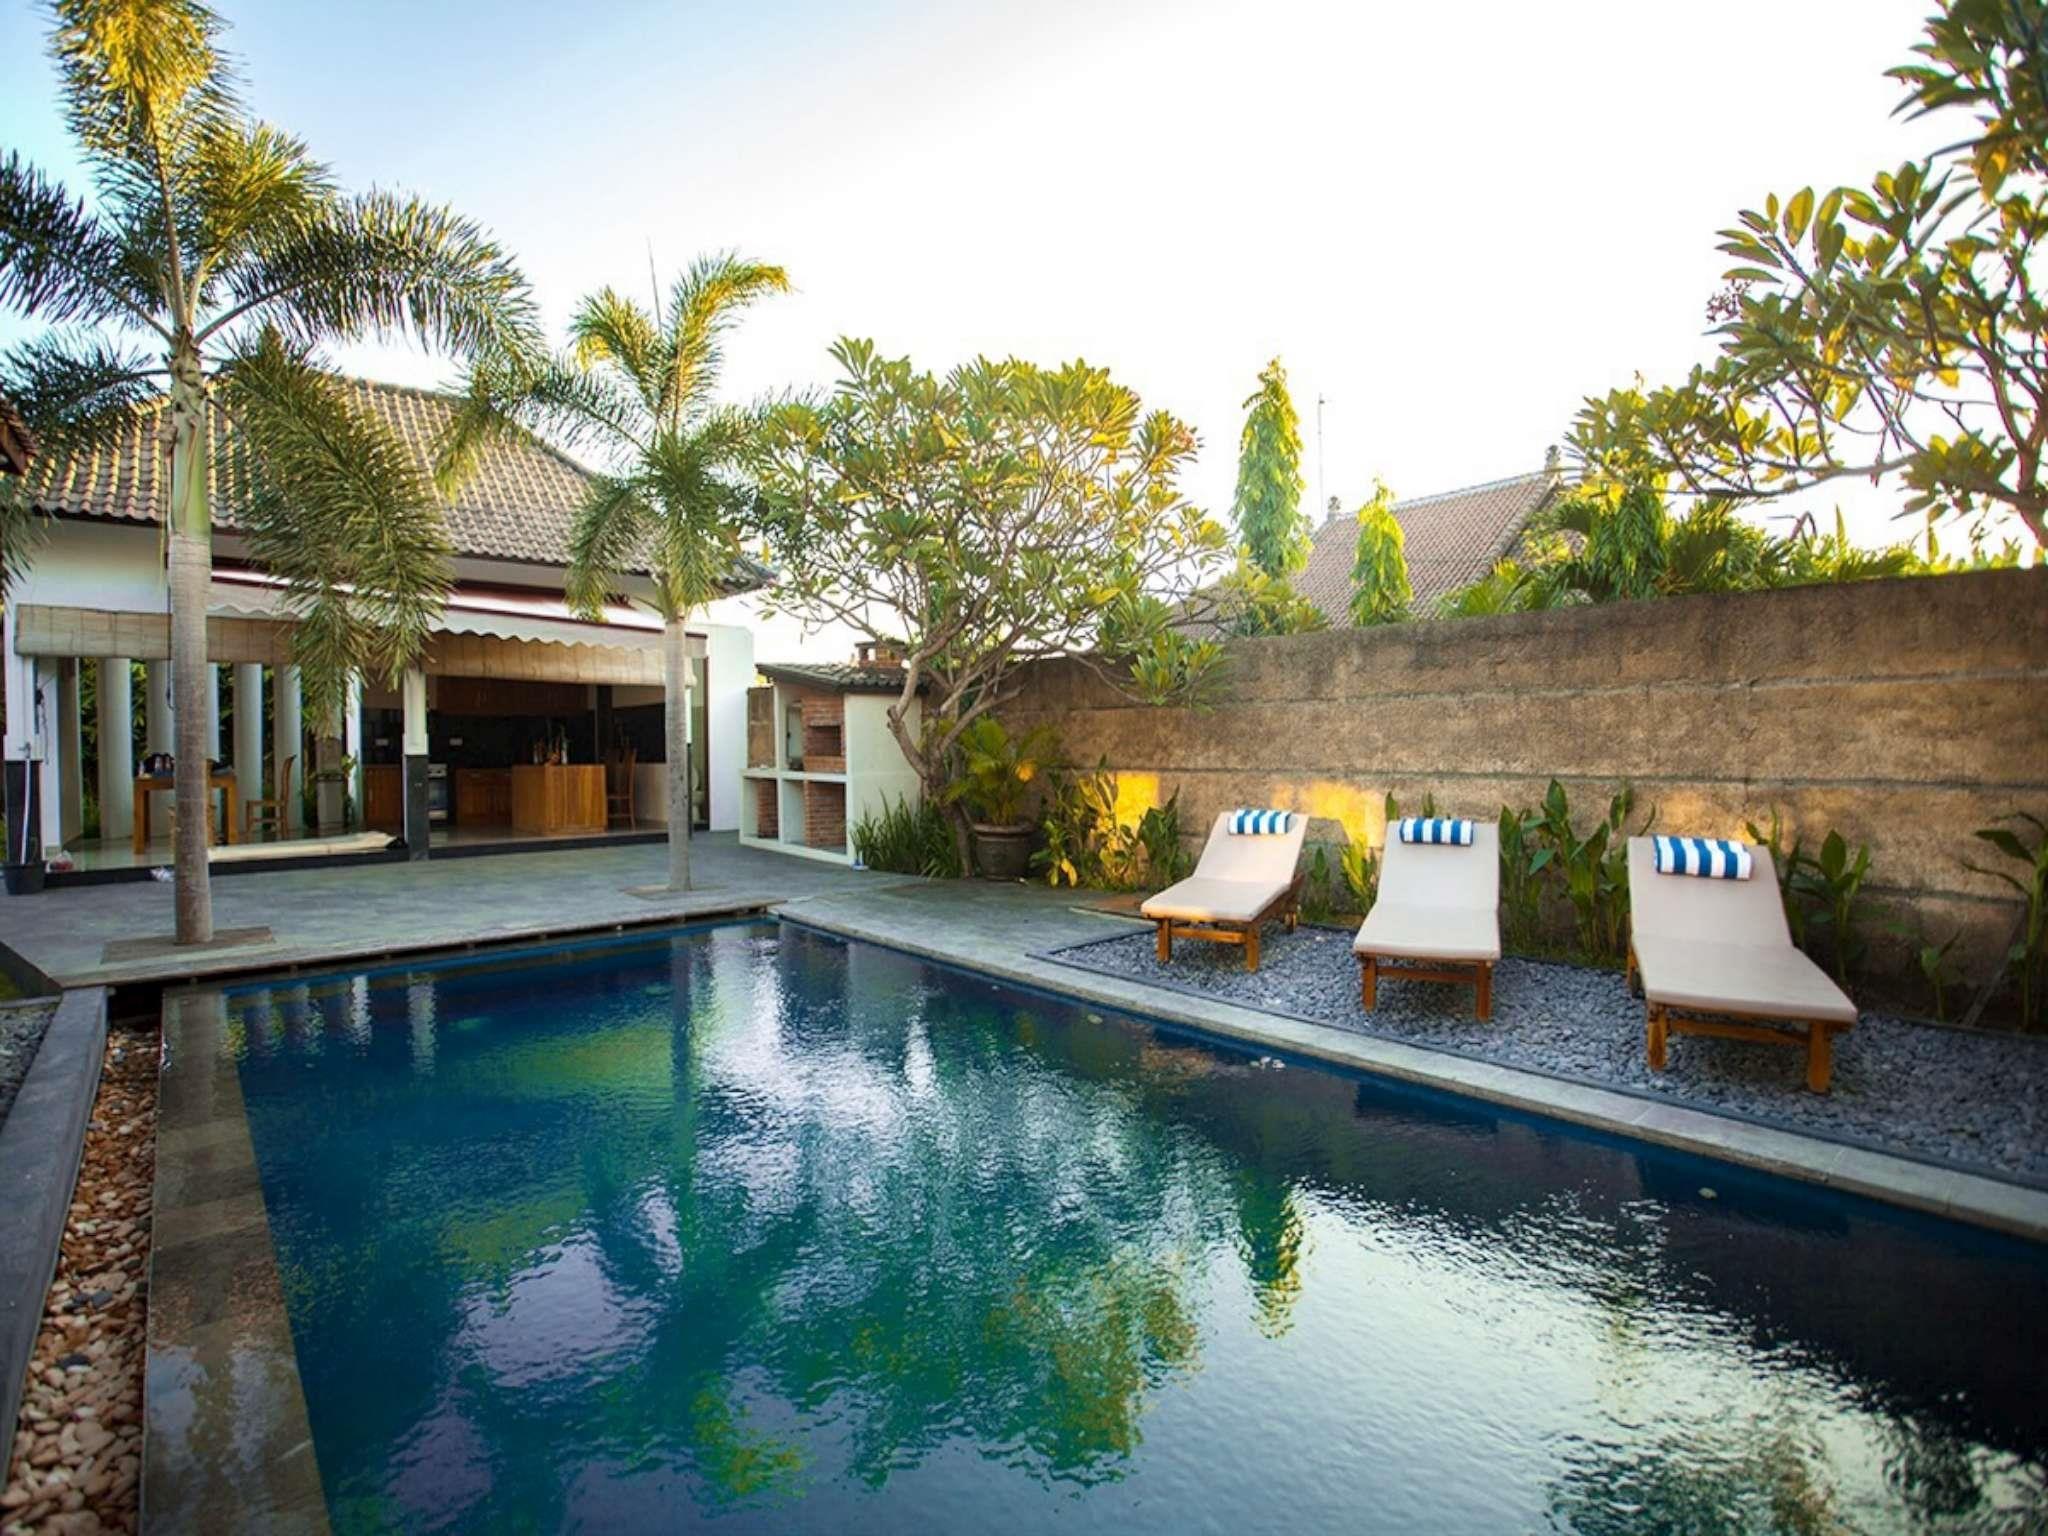 Bali My Villa Canggu Indonesia, Asia